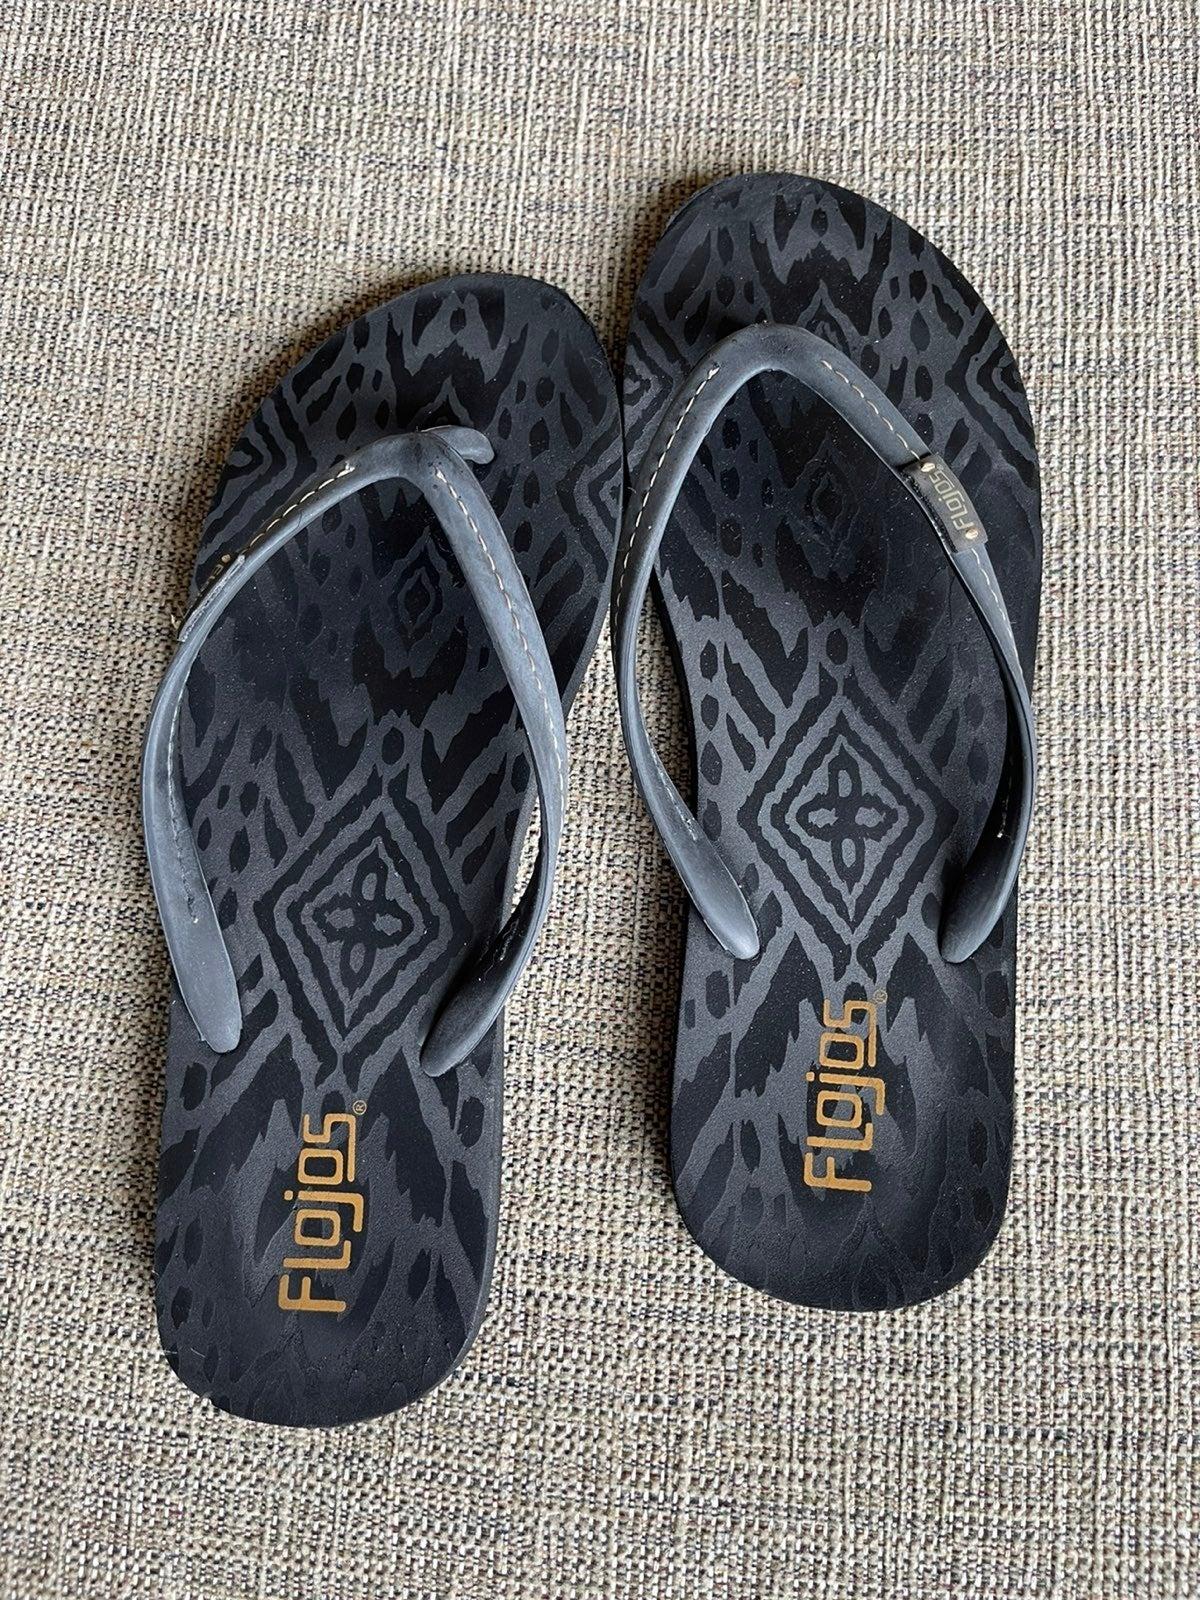 Black Flojos flip flops size 9